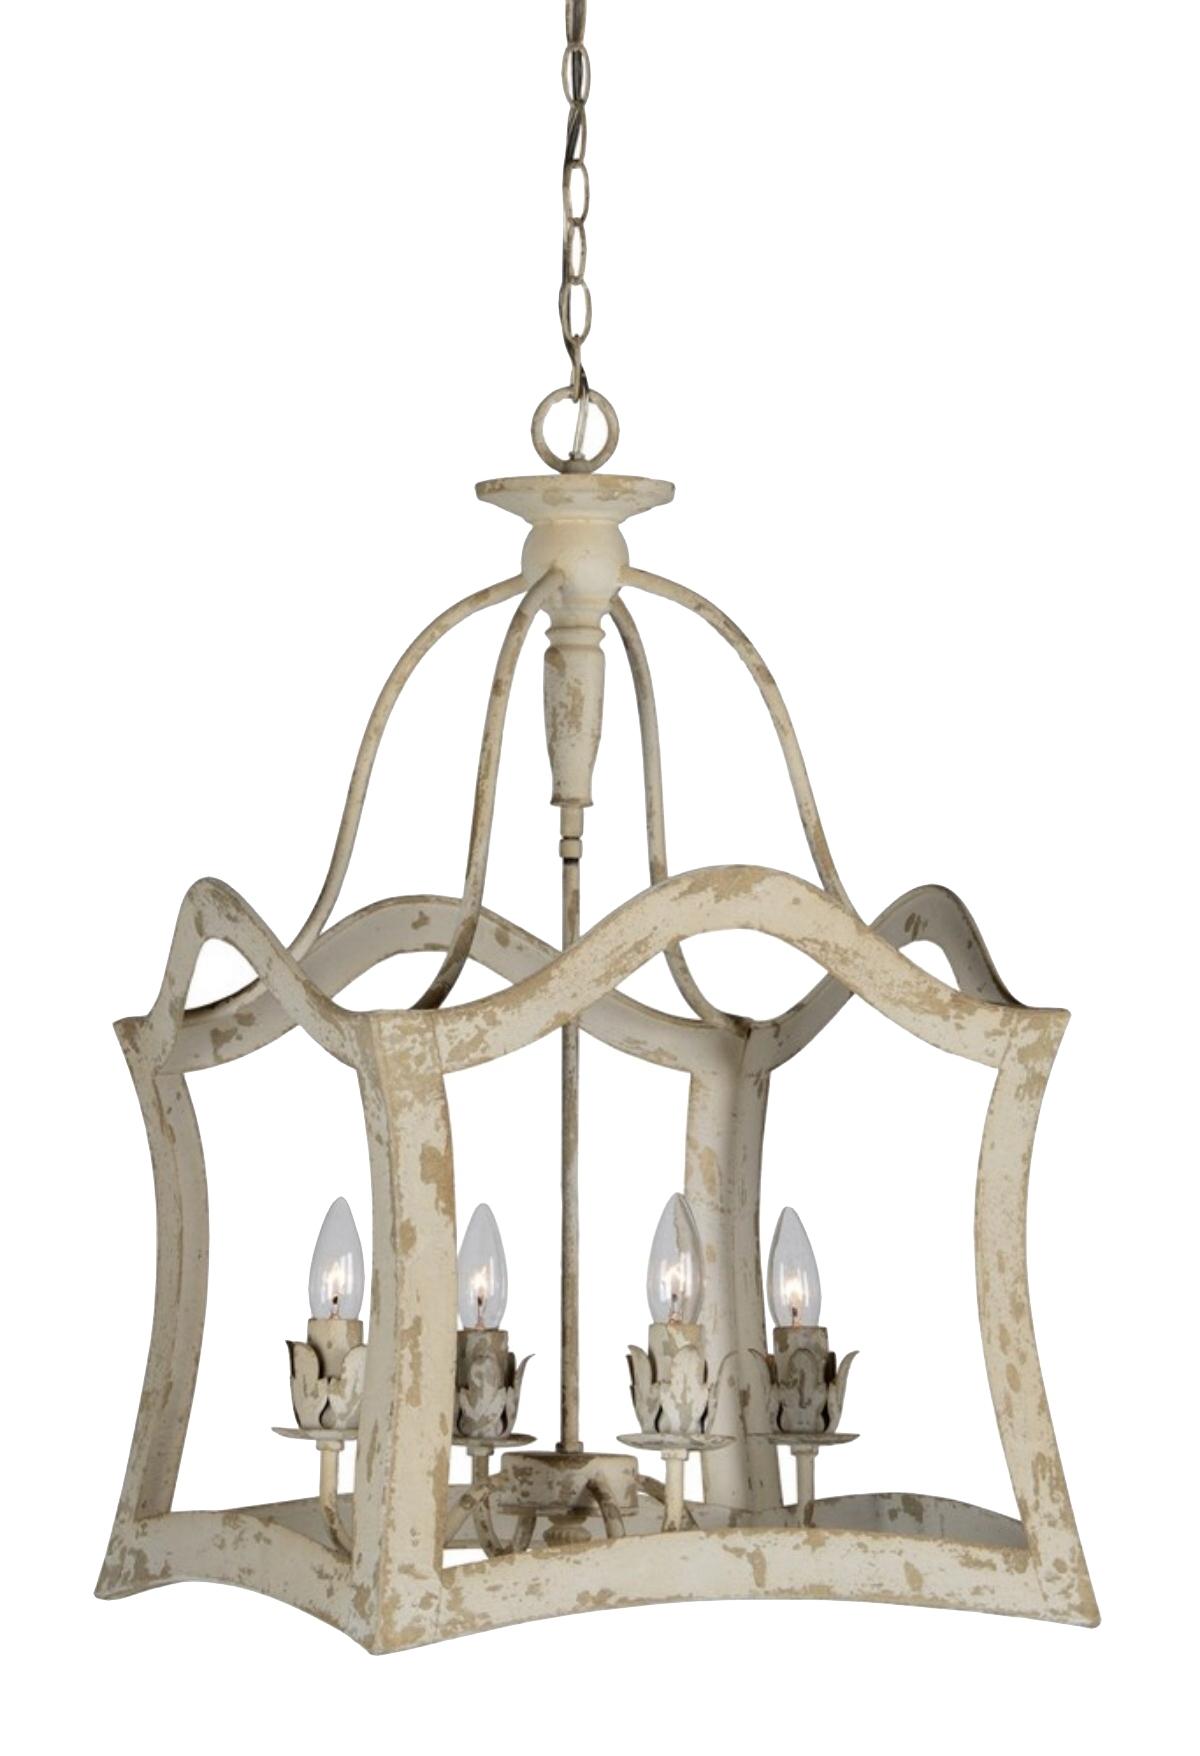 Wood Framed Aged Aubrey Chandelier Antique Style Light 1